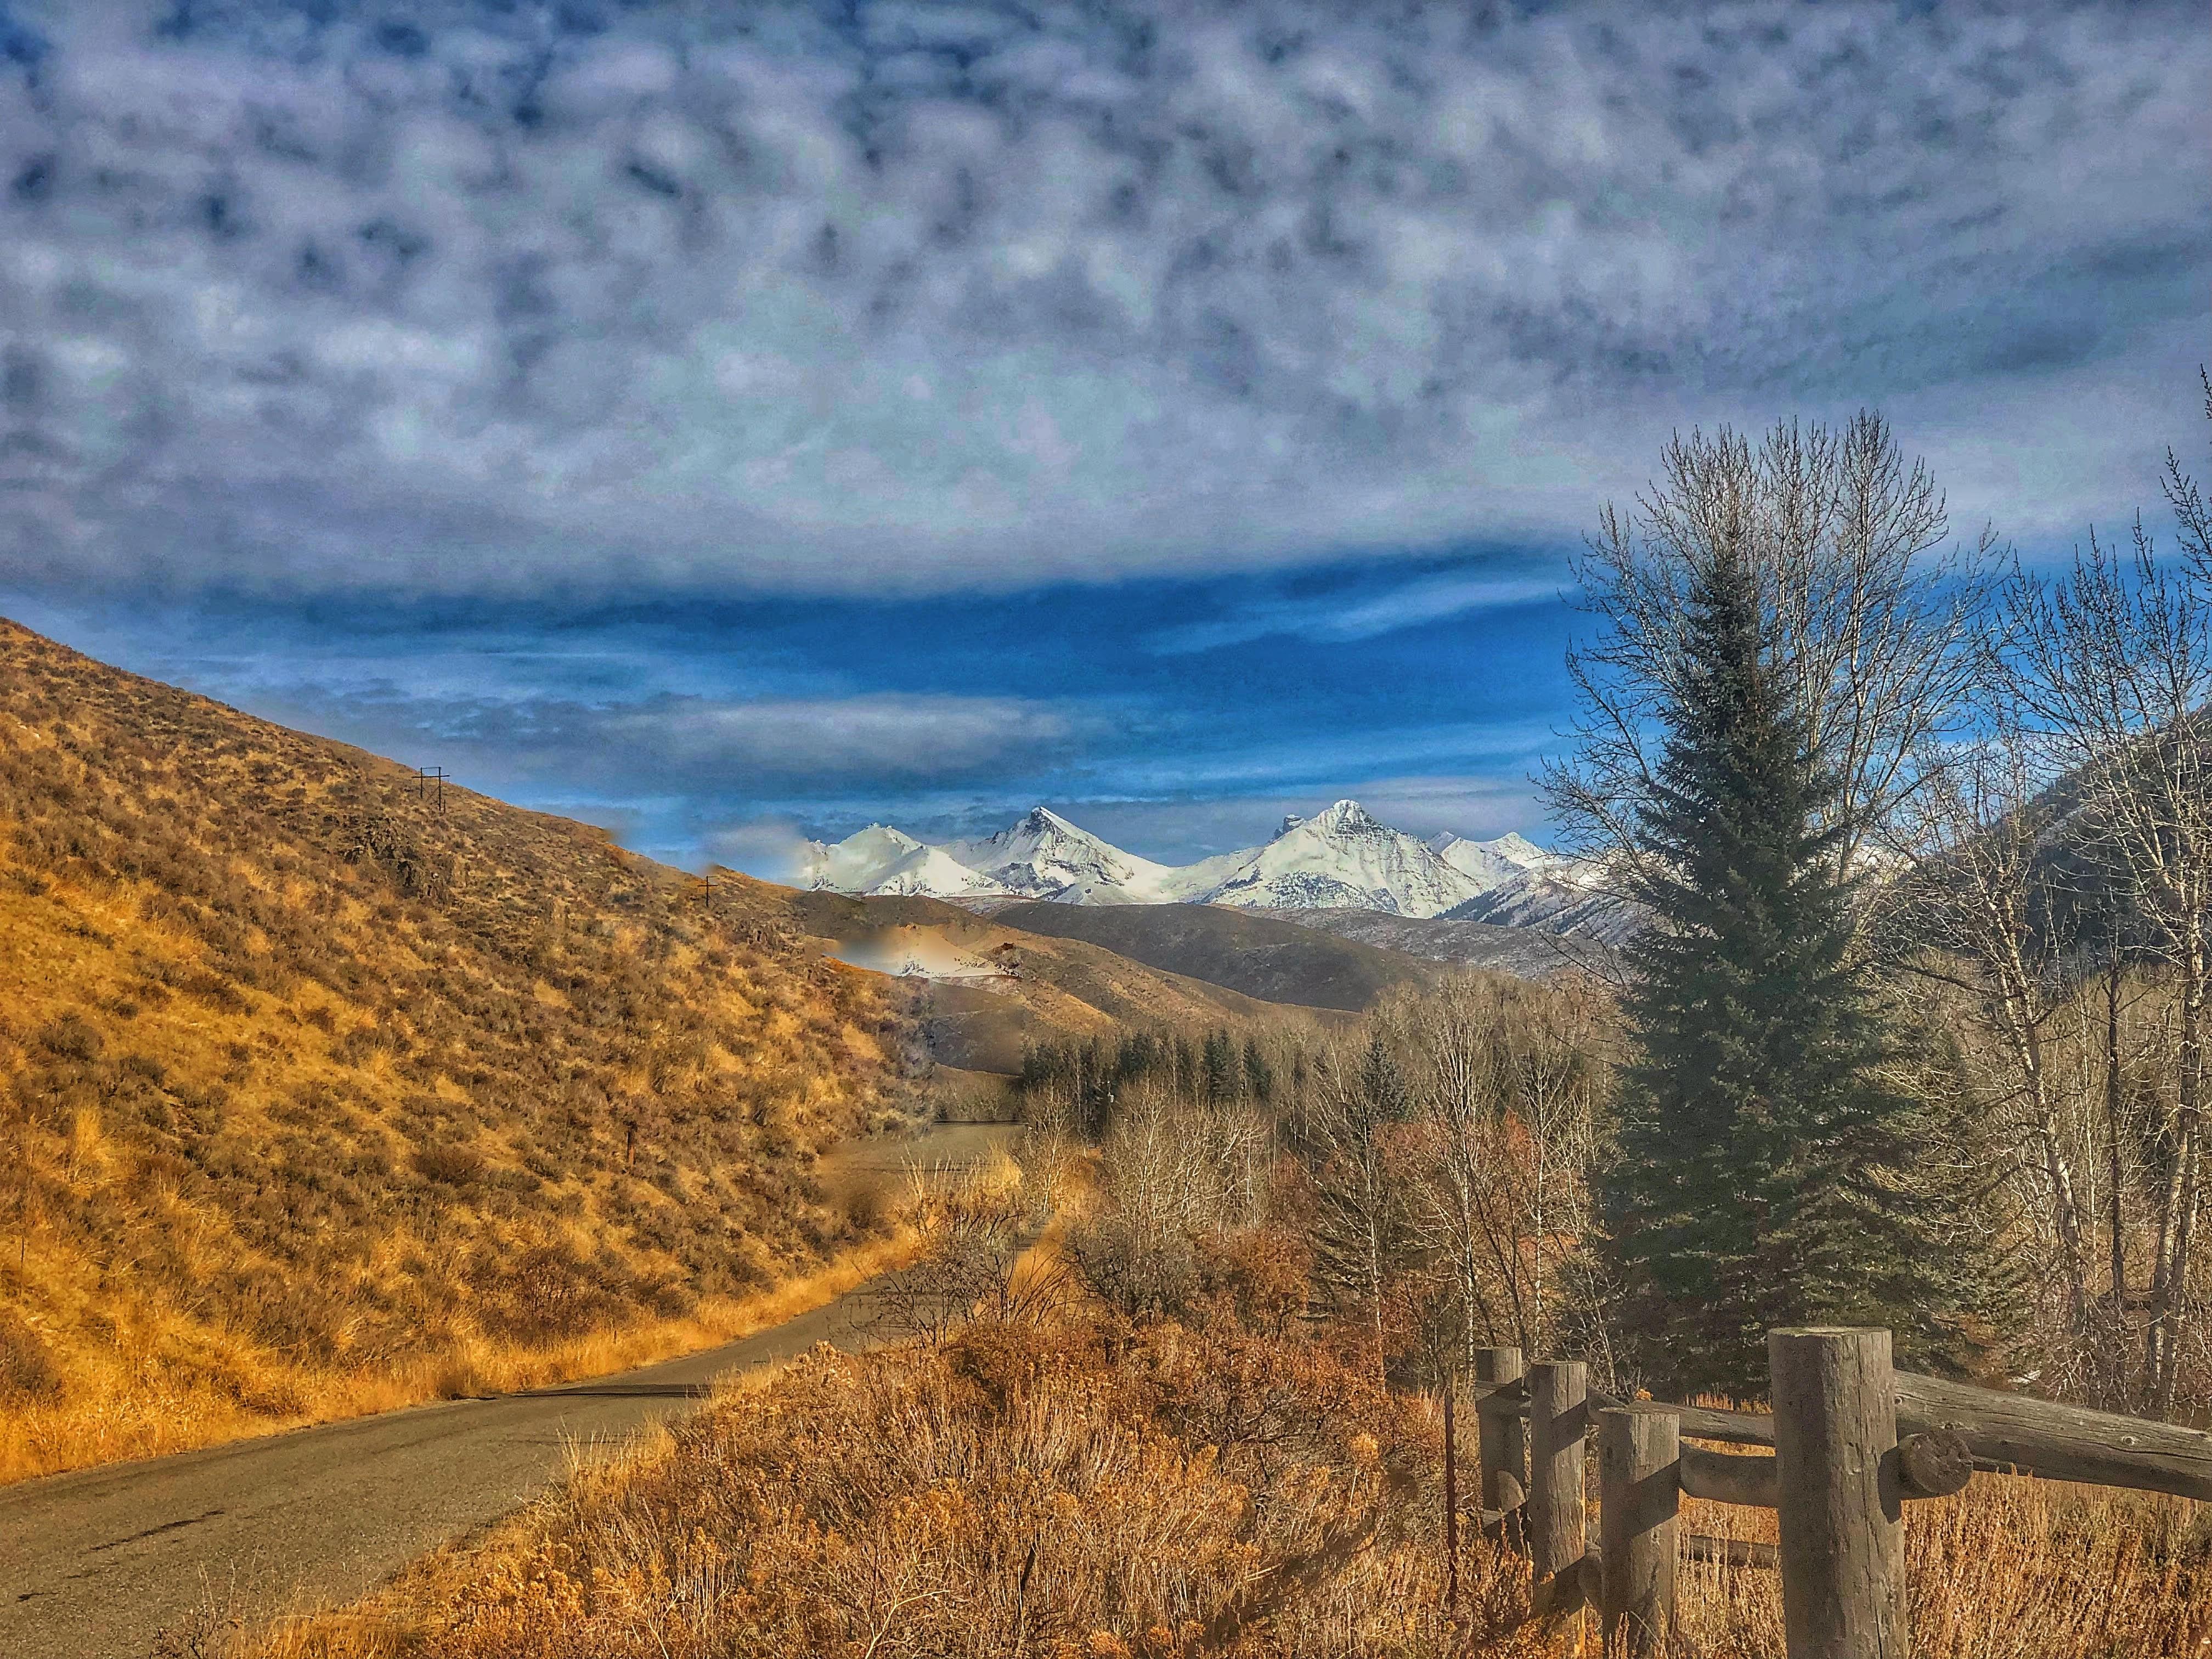 East Fork, South of Ketchum, Idaho